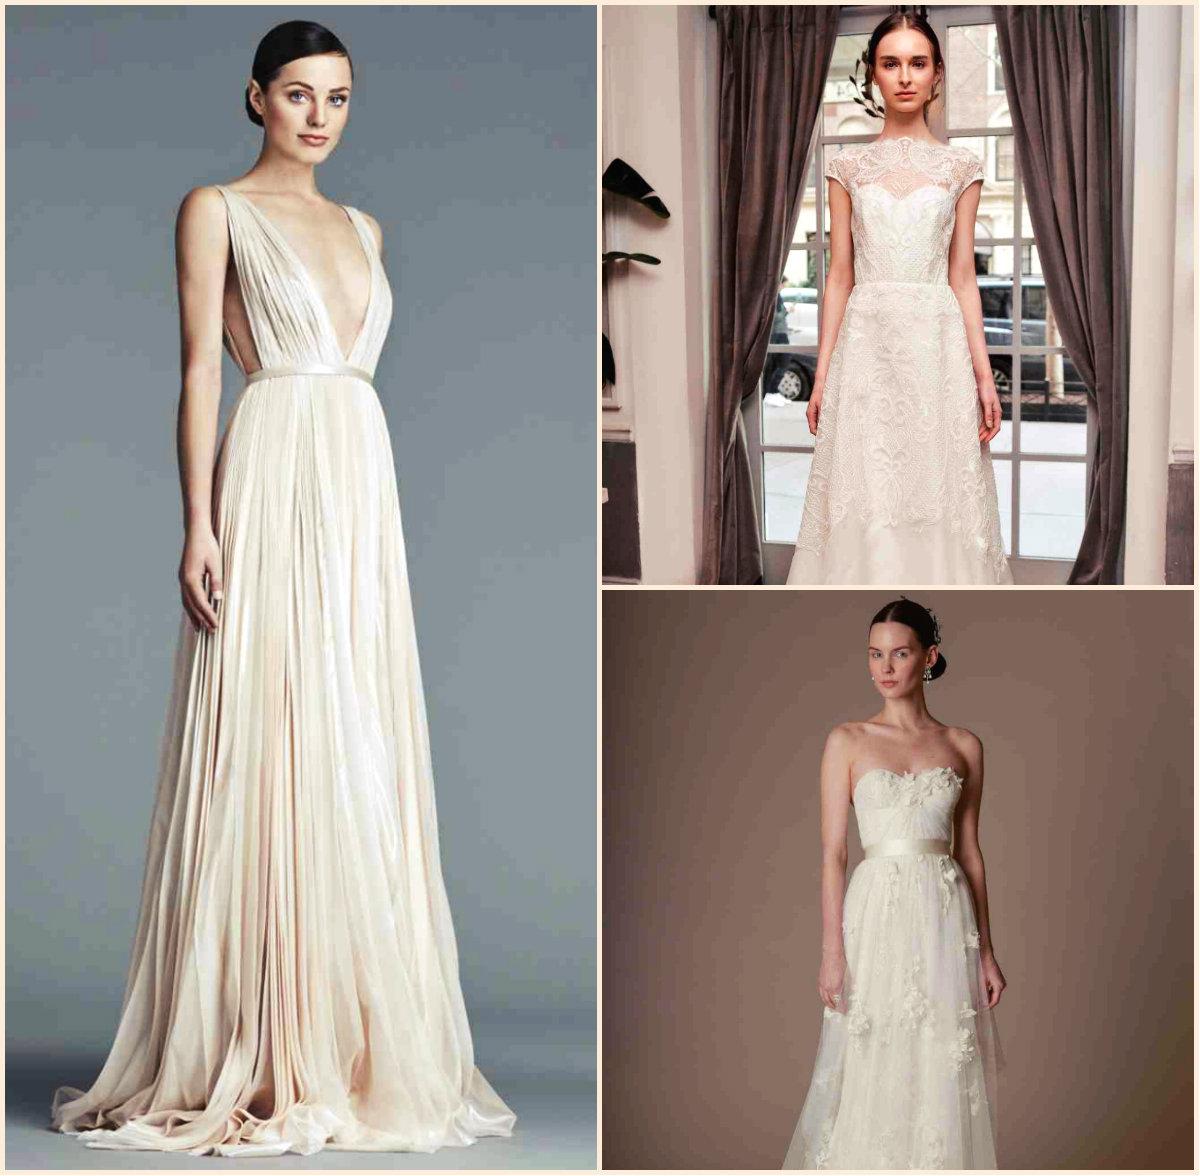 Cool Runways Spring 2016 Bridal Hairstyles And Dresses Hairstyles Short Hairstyles Gunalazisus